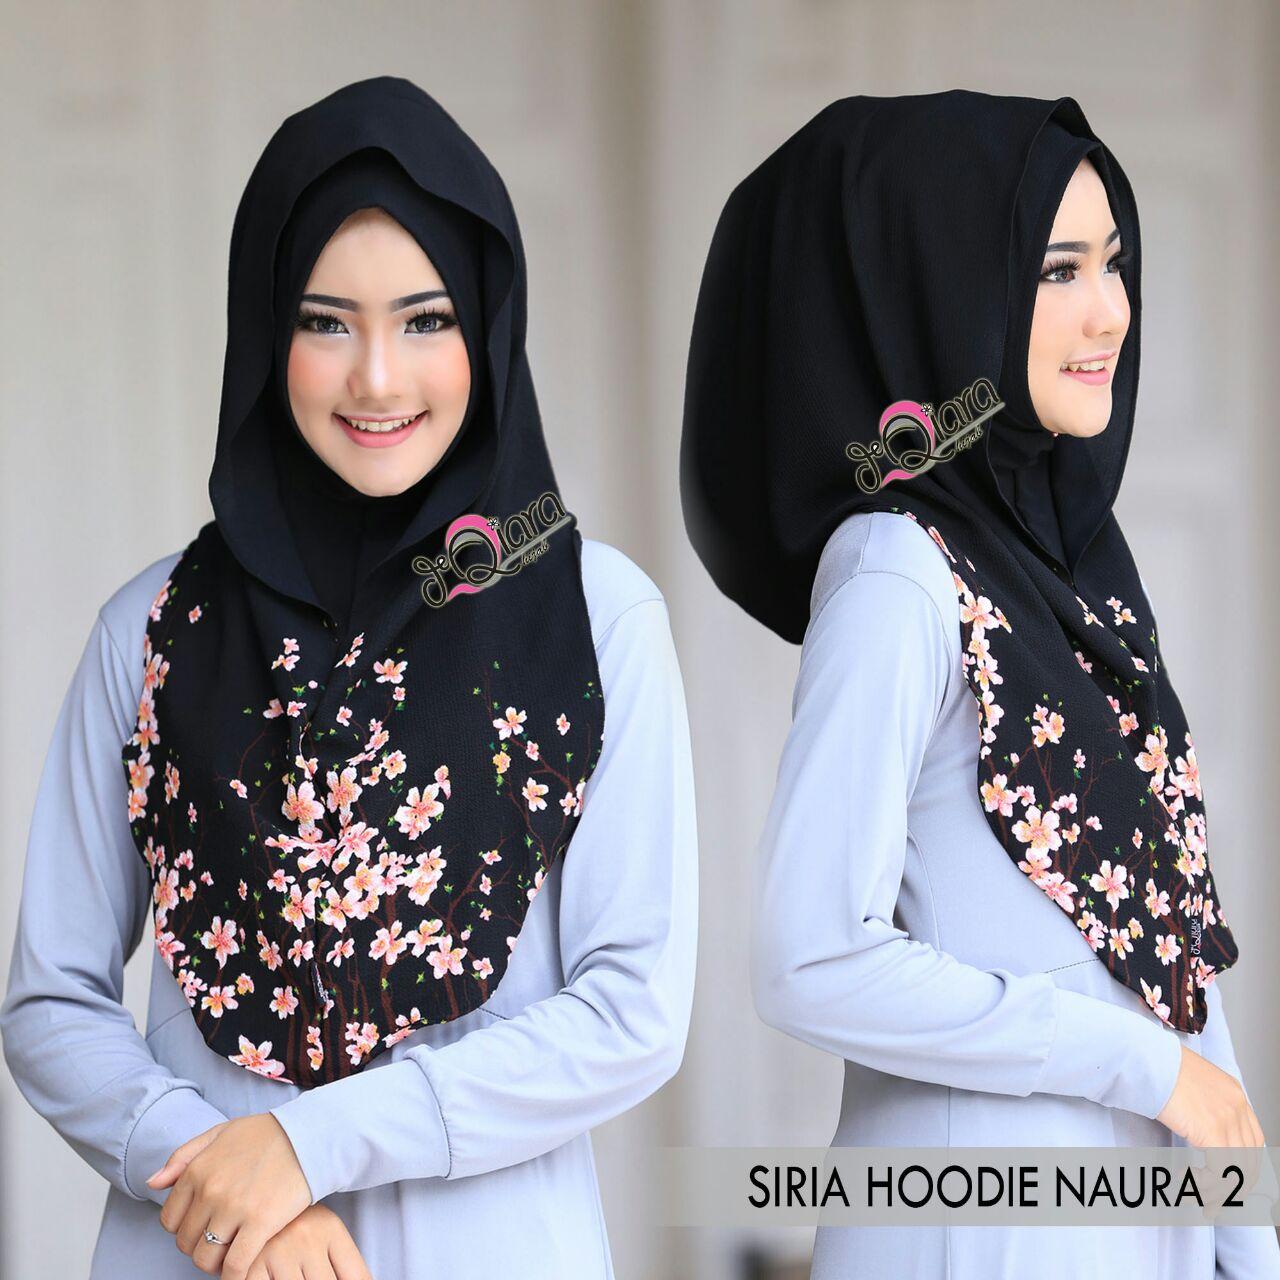 Square Hijab Naura Series Peach Daftar Harga Terbaru Dan Suqma Pashmina Butterscotch Siria Hoodie By Deqiara